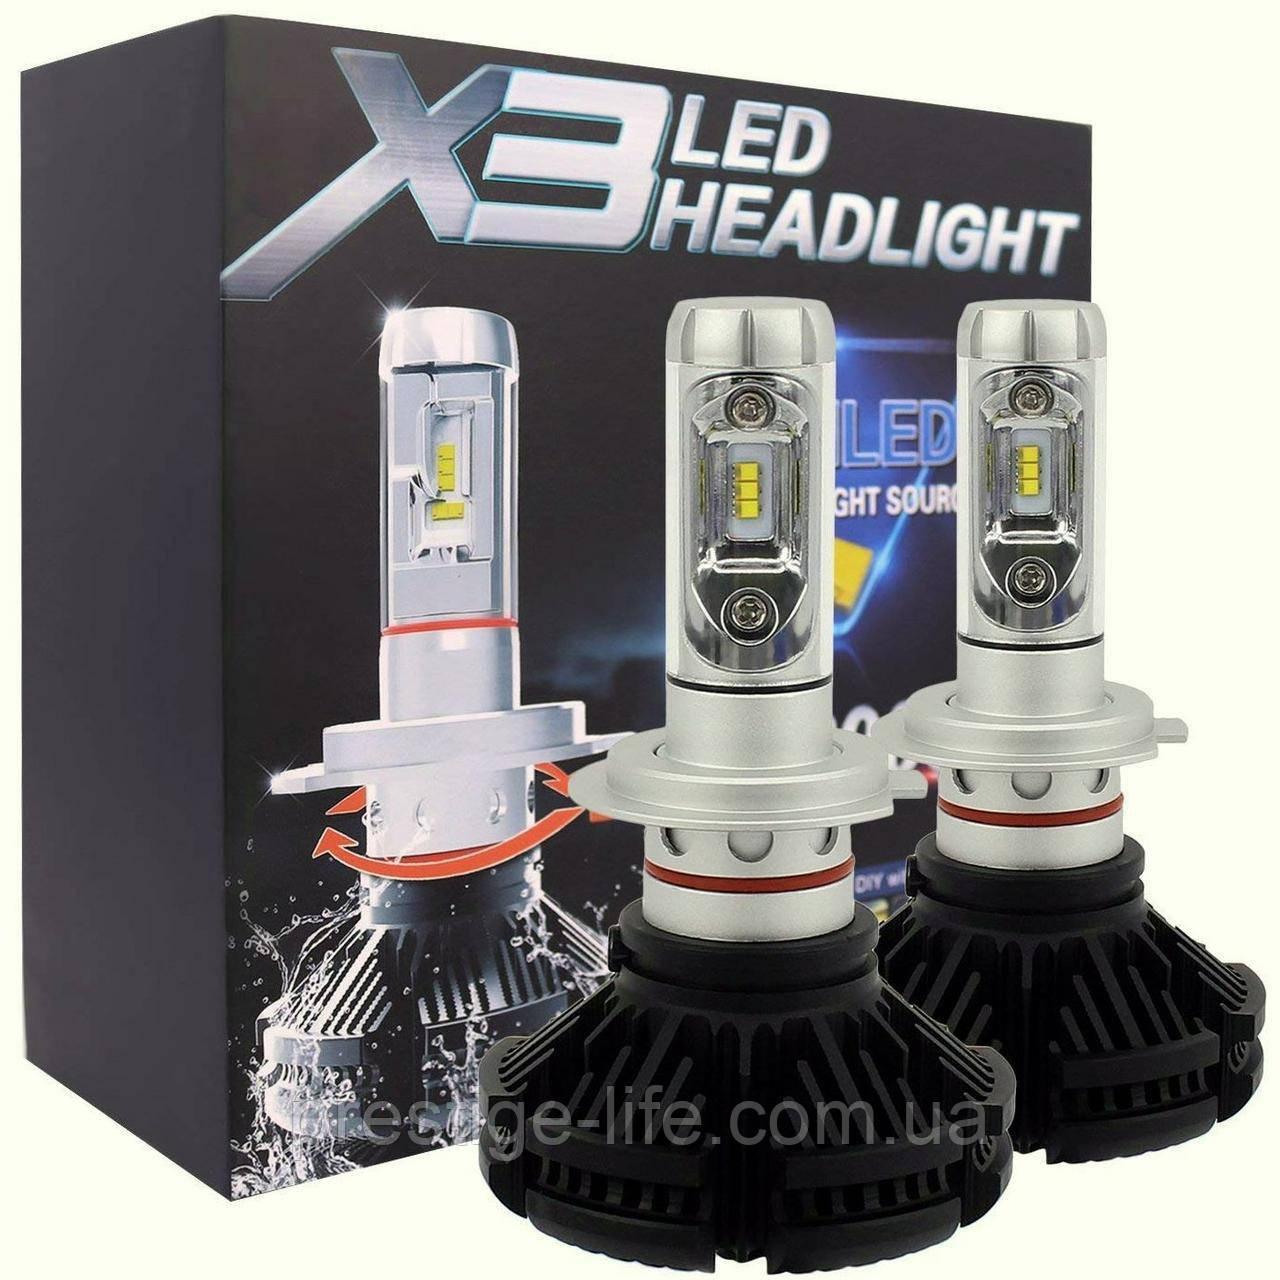 Лед лампы. LED лампы комплект X3 Н7 (ZES, 6000LM, 50W)